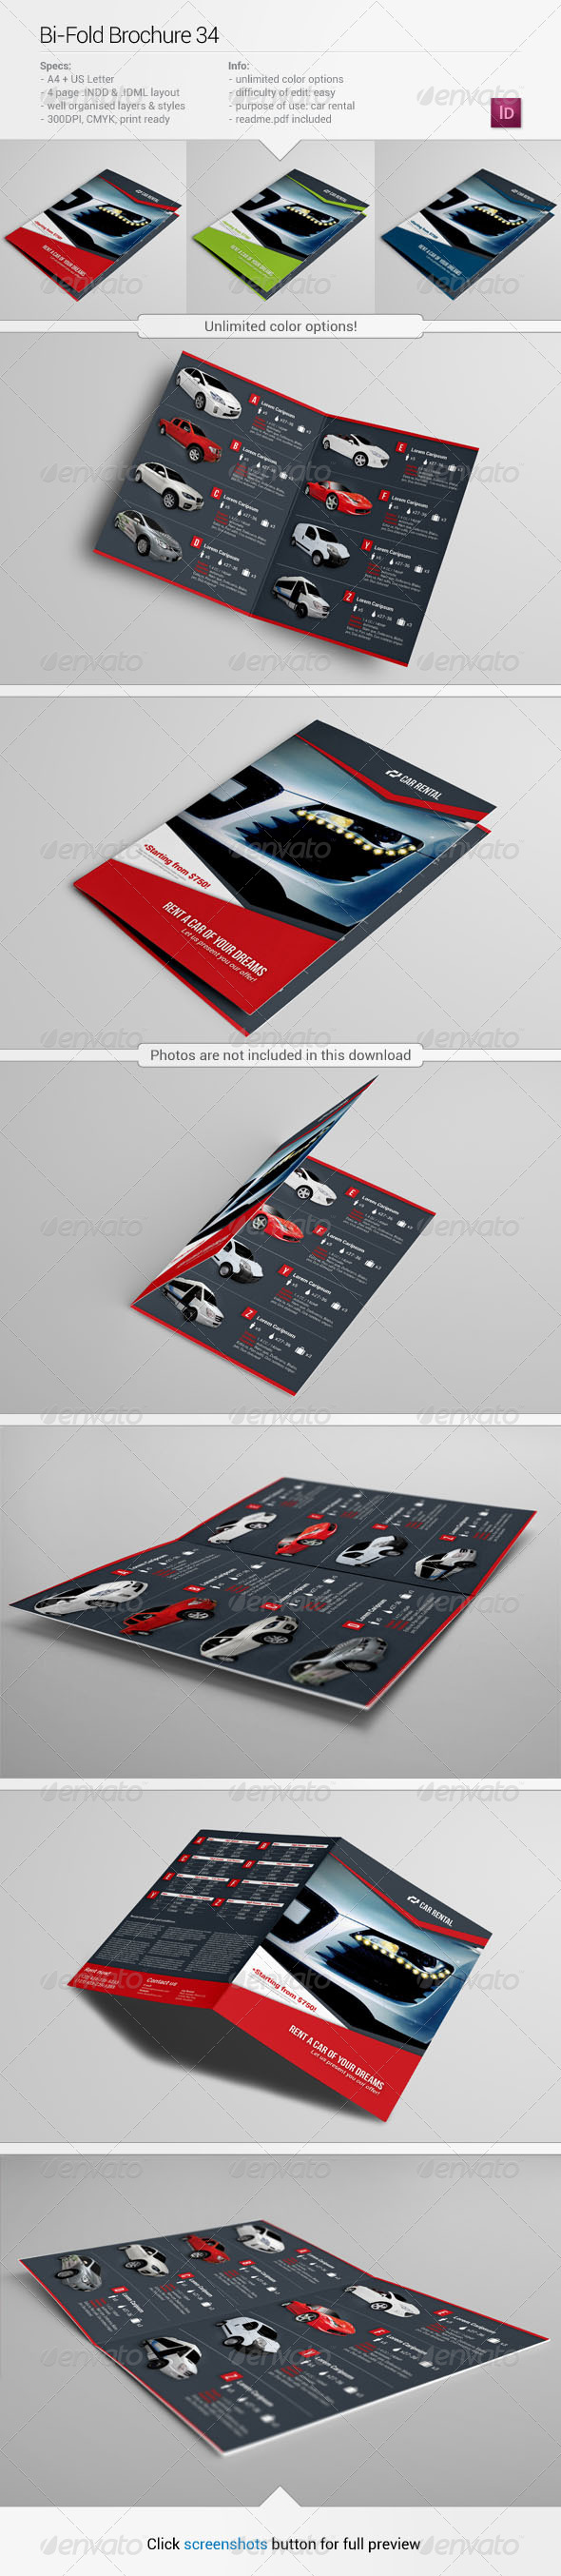 Bi-Fold Brochure 34 - Informational Brochures